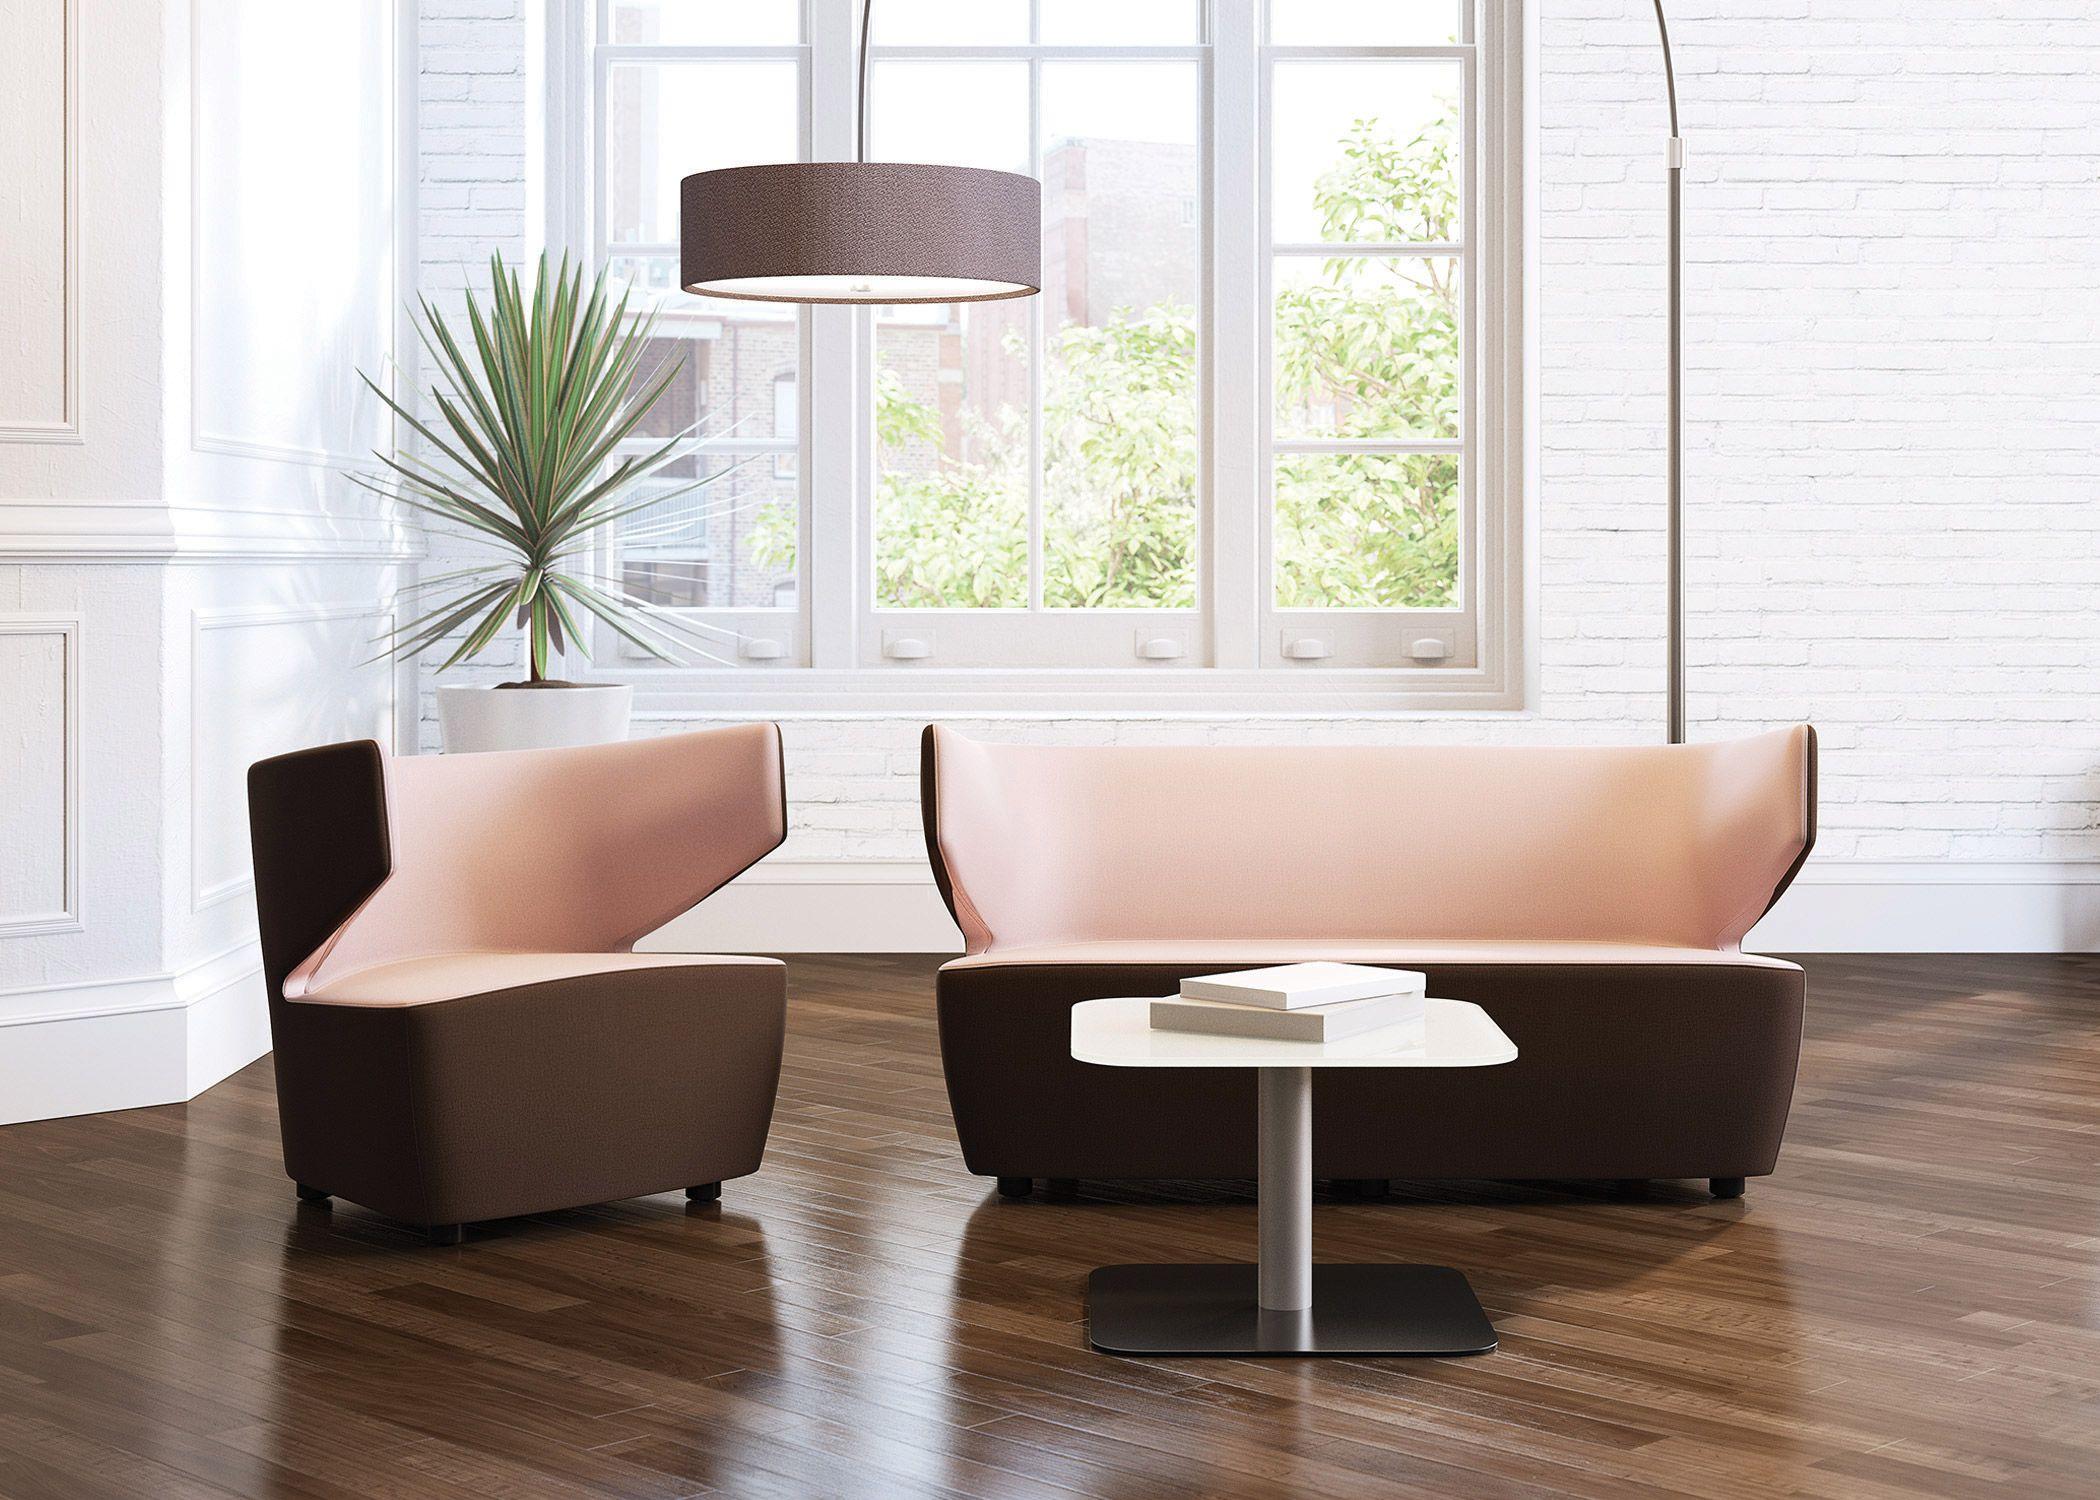 Marcelo National Office Furniture Marcelo